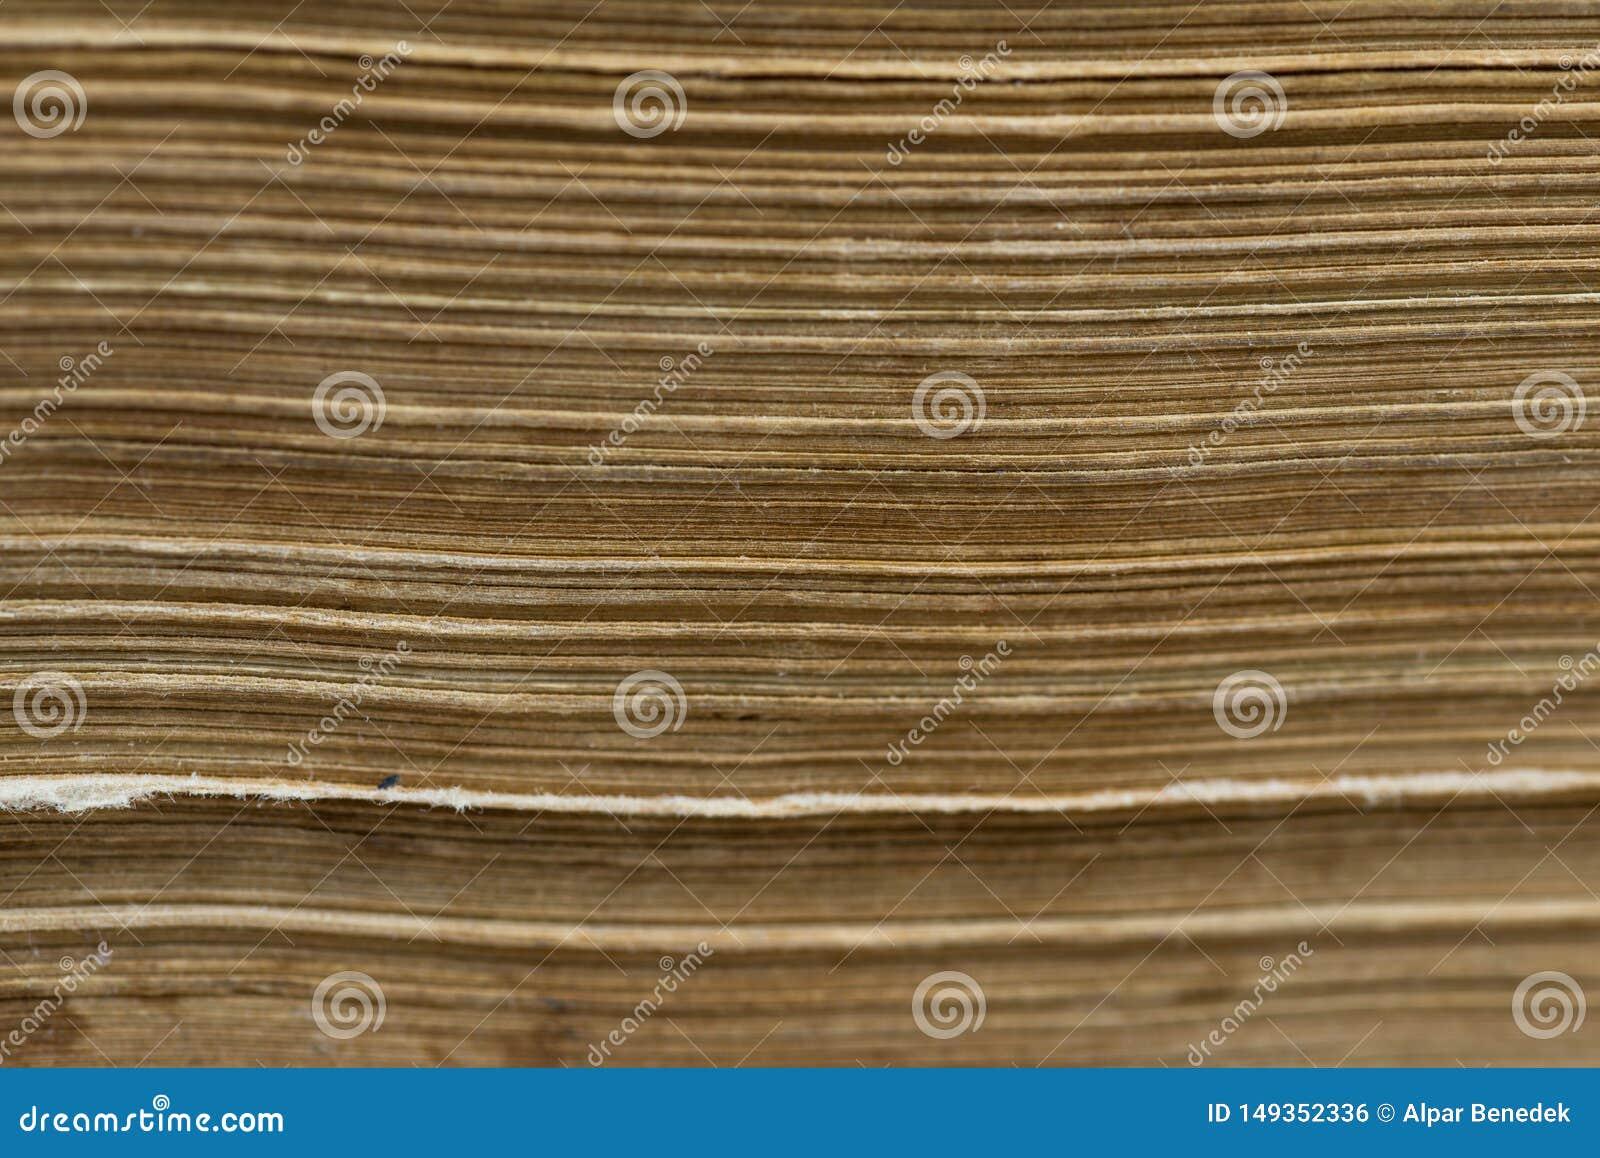 Horizontal old aged yellow book pages close up macro shot